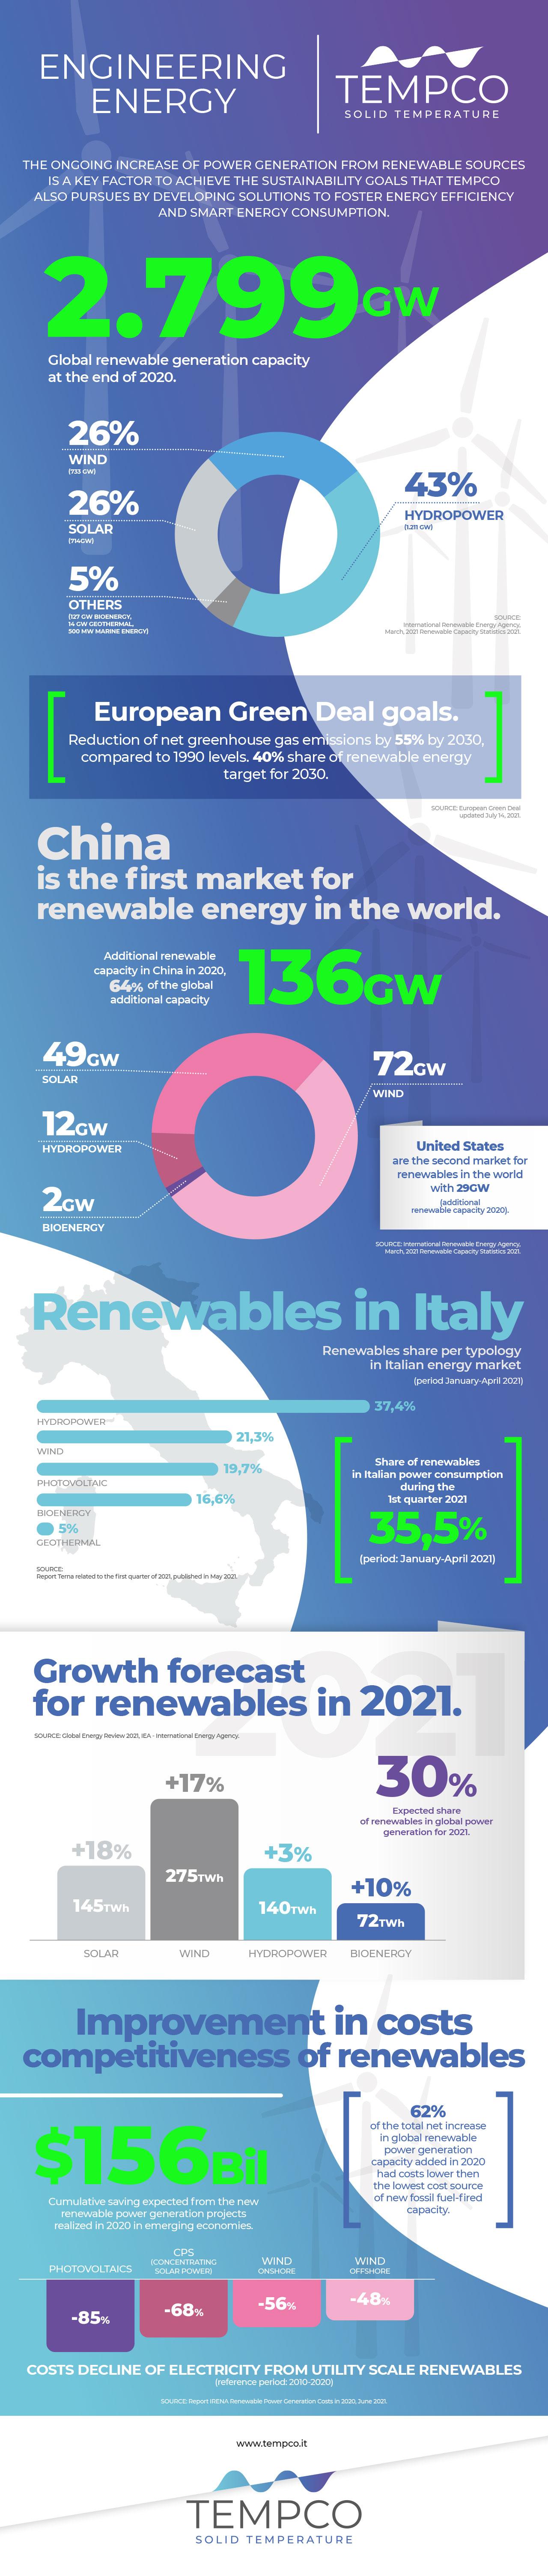 Infographic - Engineering Green